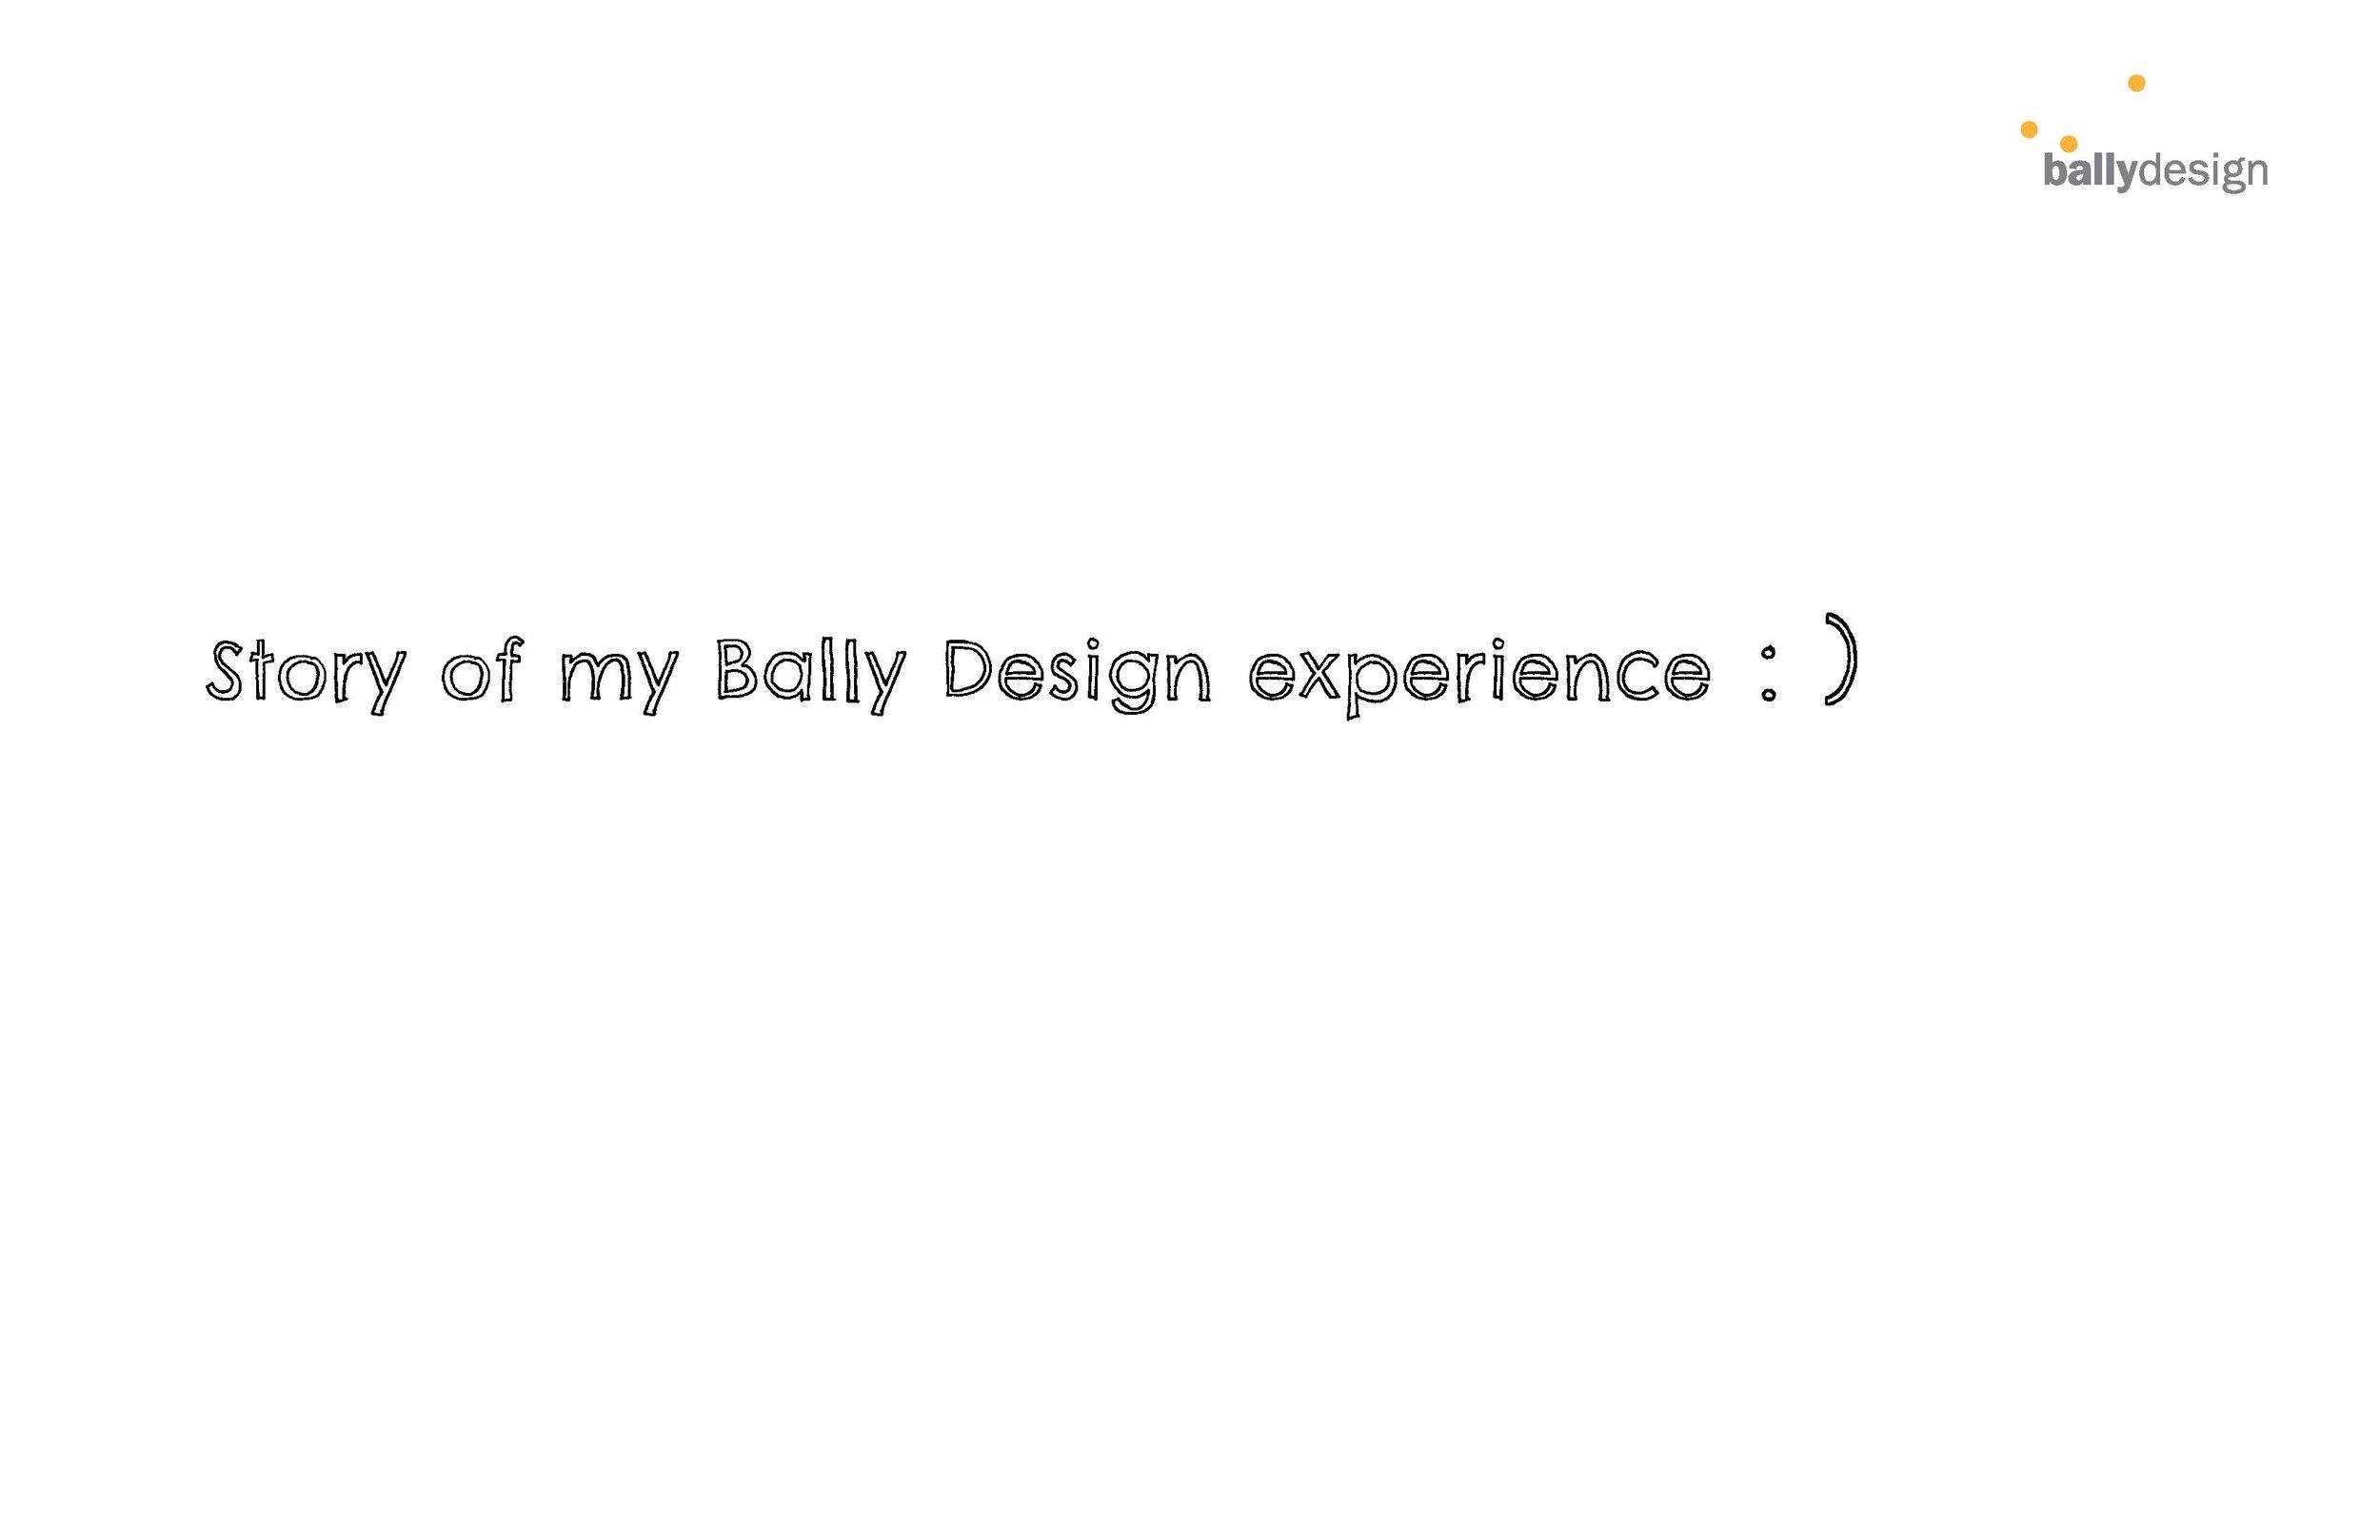 Real_Internship Final Presentation_Page_04.jpg